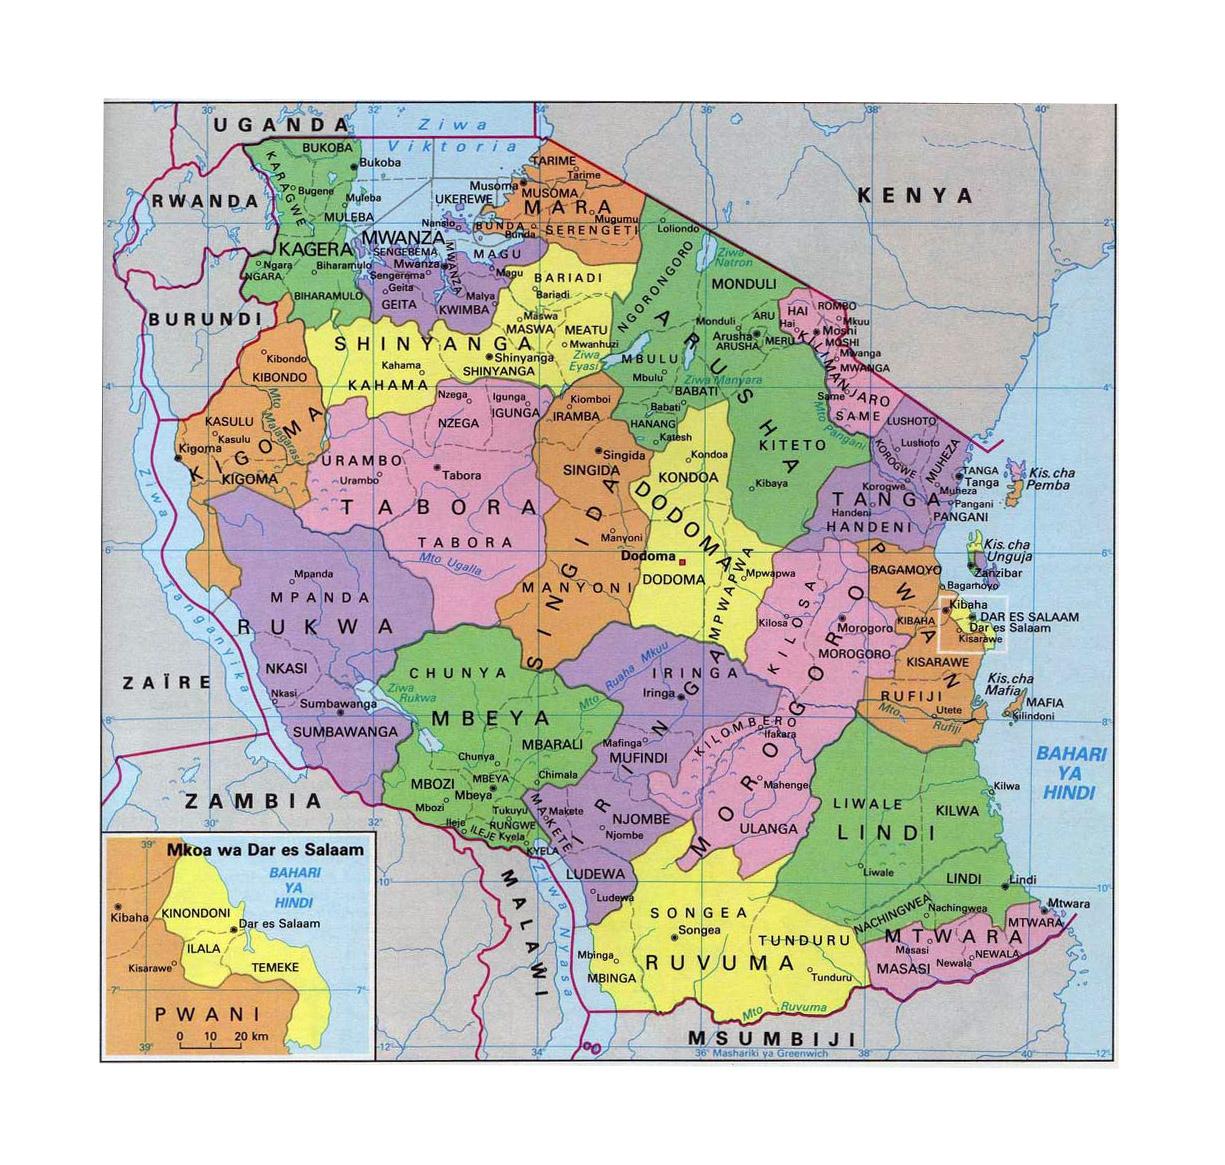 Detailed Administrative Map Of Tanzania Tanzania Africa - Map of tanzania